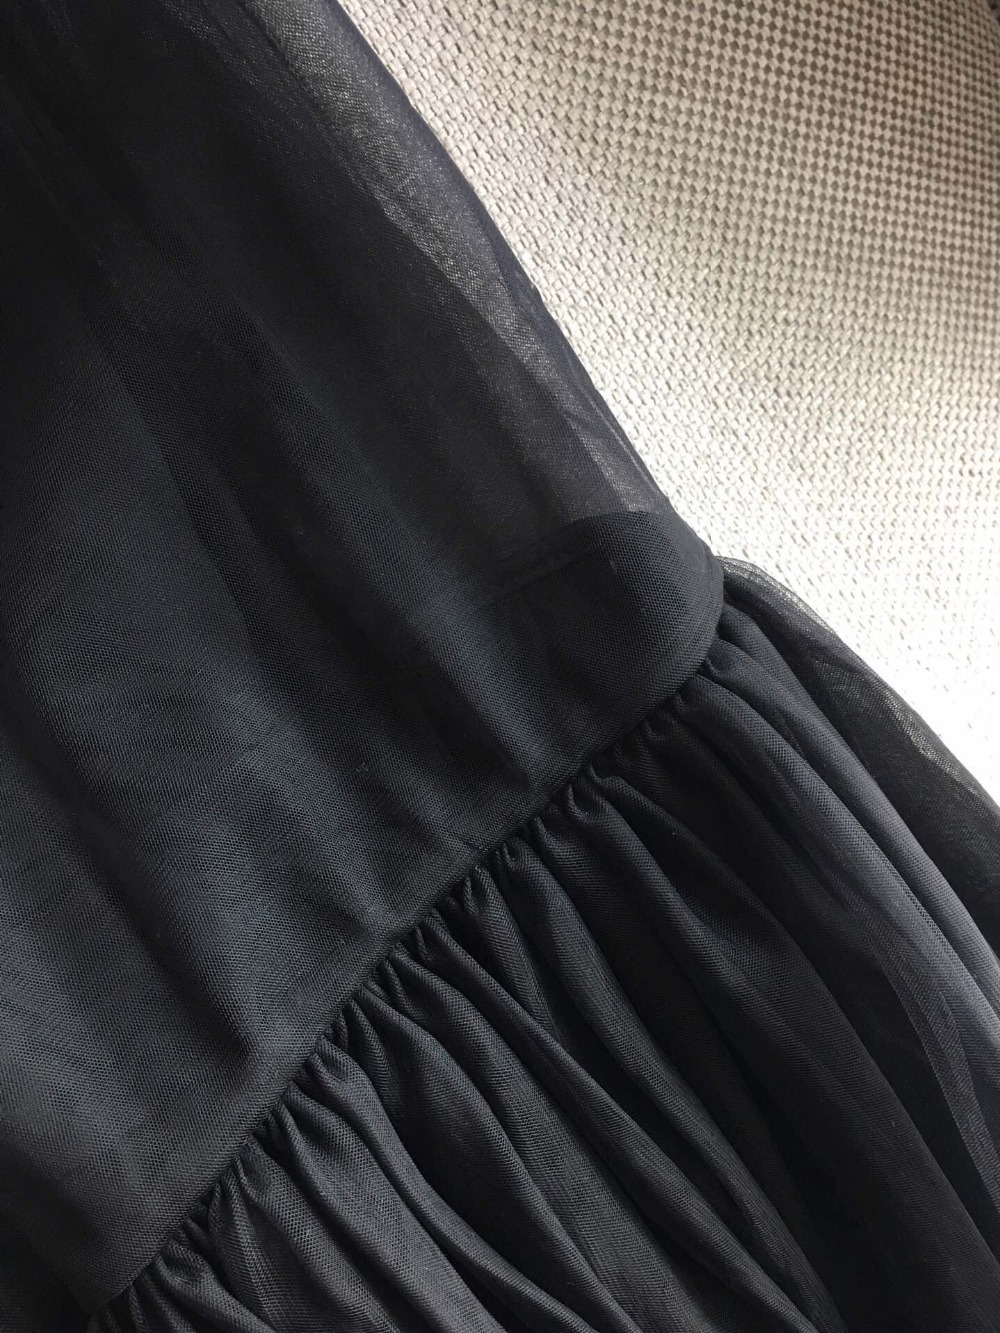 Femmes Quttwpt 2019 Ddxgz2 Mesh Bal Jupe De Nouvelle Robe Mode erCxoBd